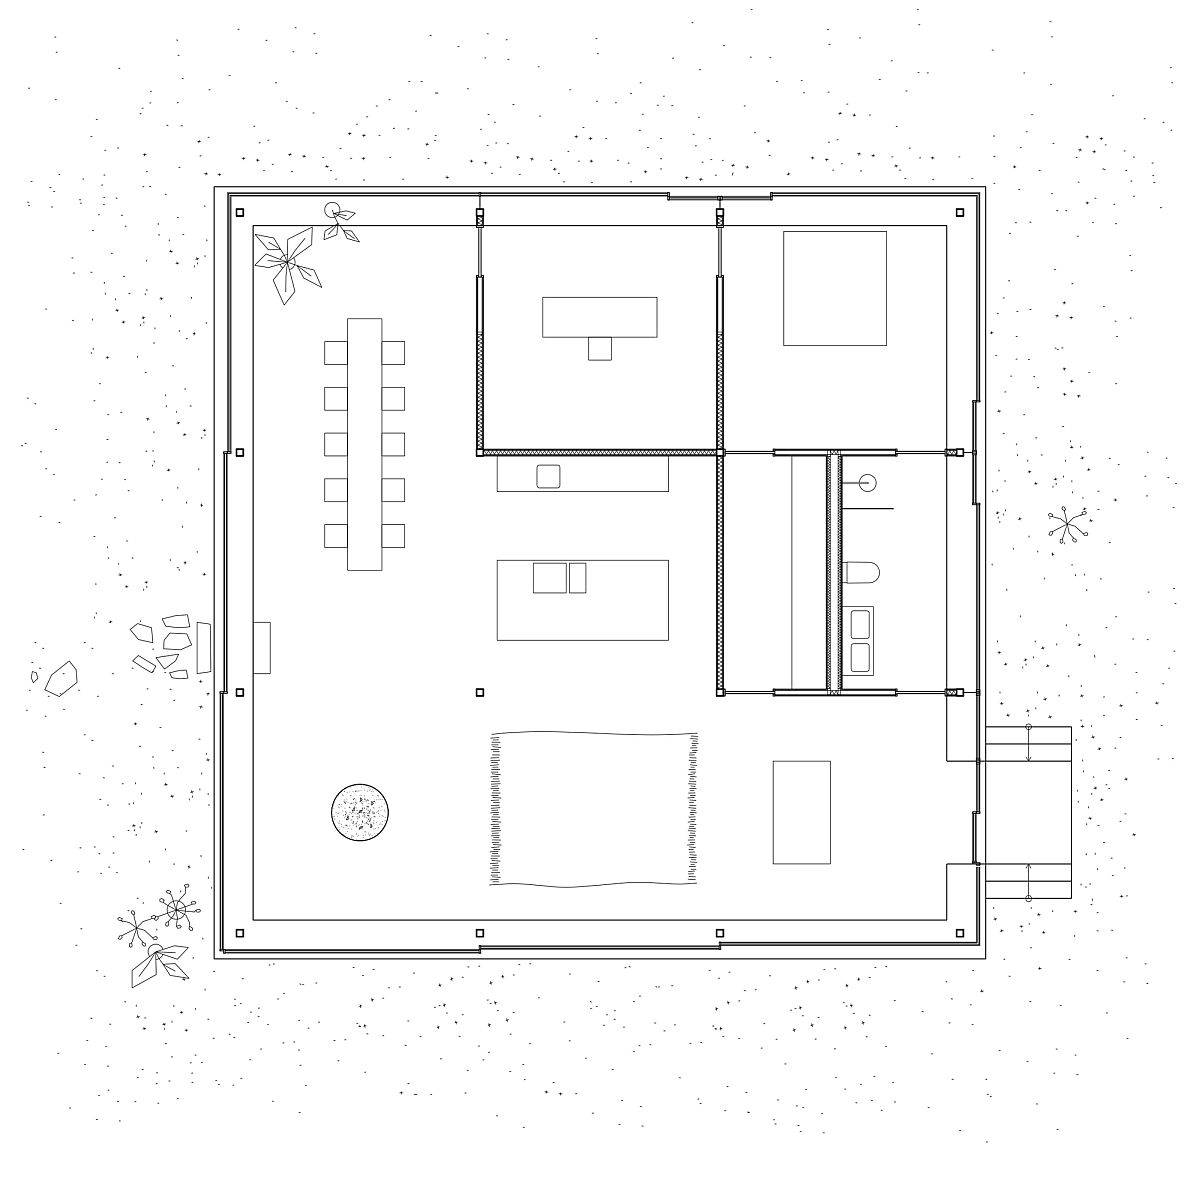 Floor-plan-of-Lilla-Ragholmen-House-by-Arrhov-Frick-Arkitektkontor-in-Sweden-56070